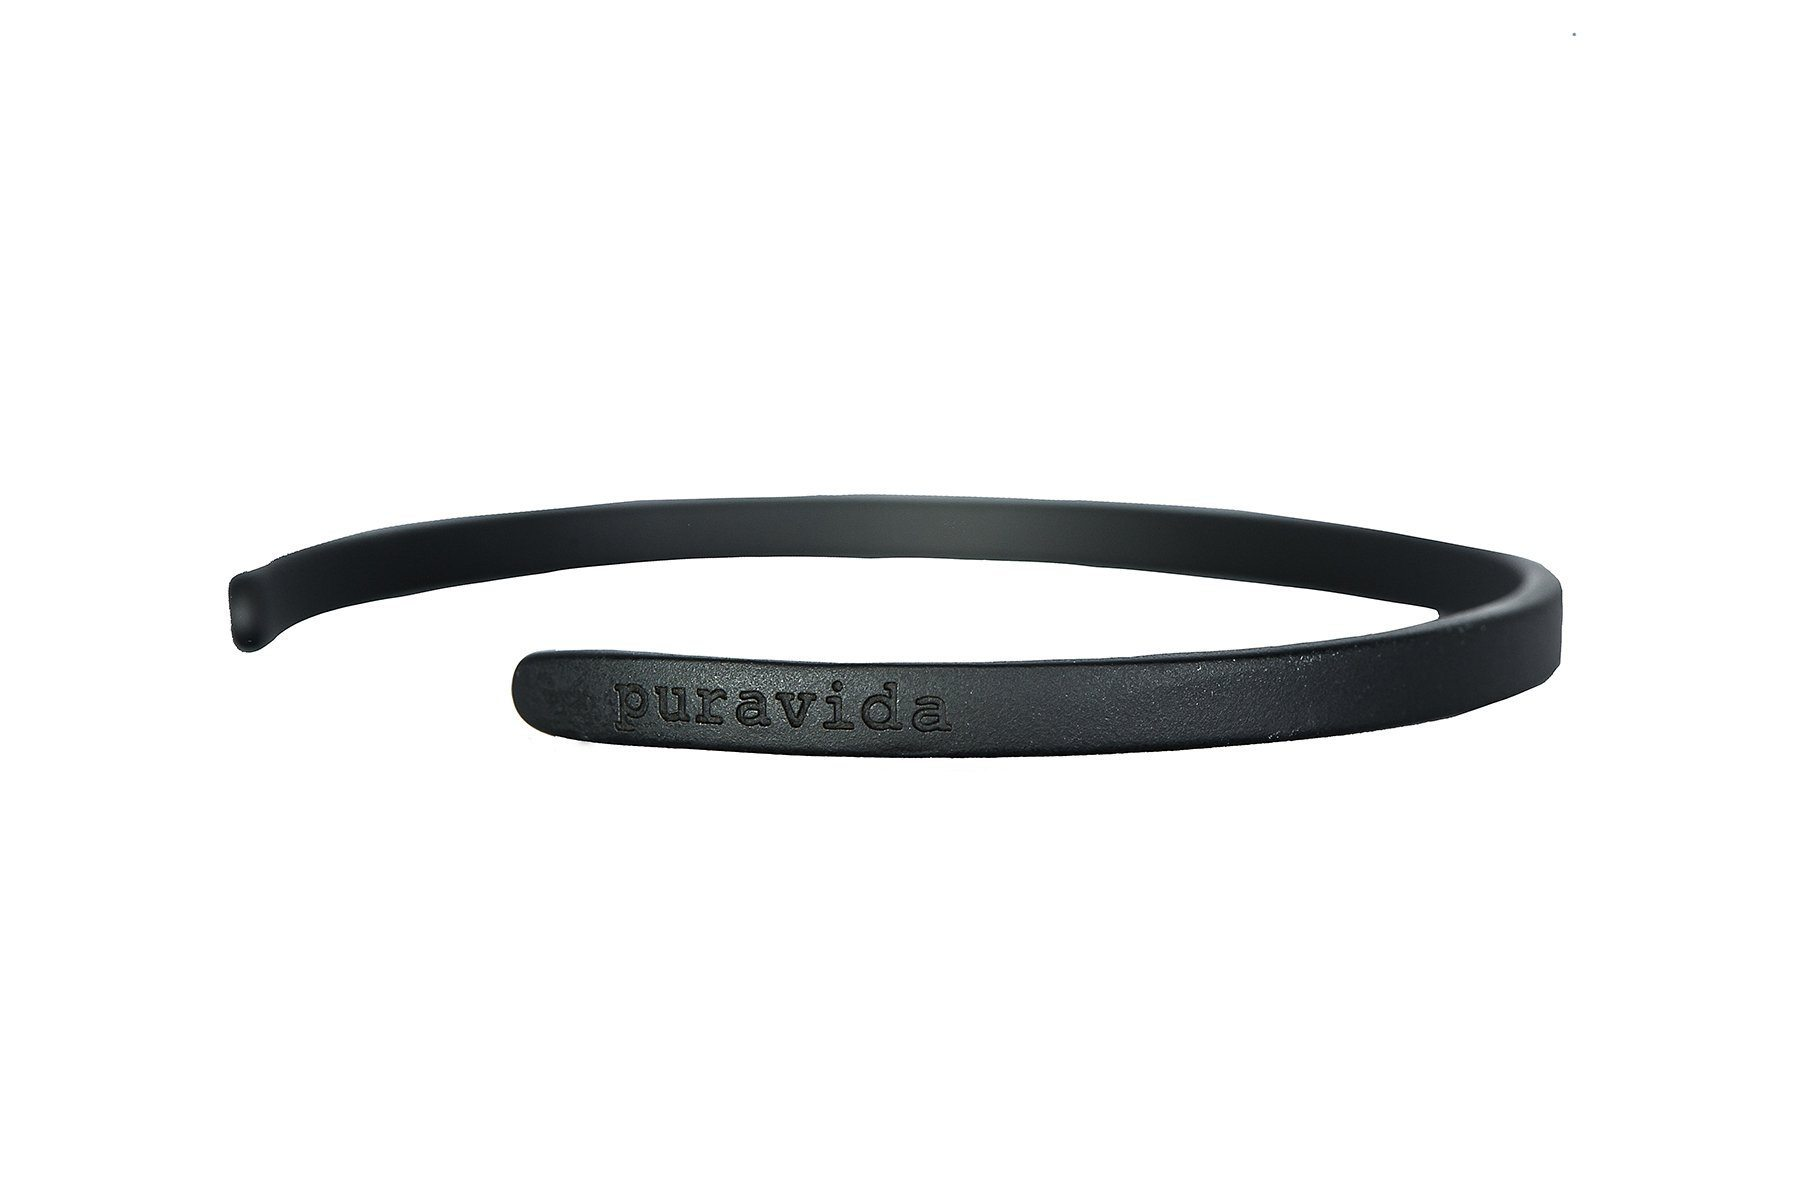 Pura vida cuff pura vida pura vida bracelets matte black